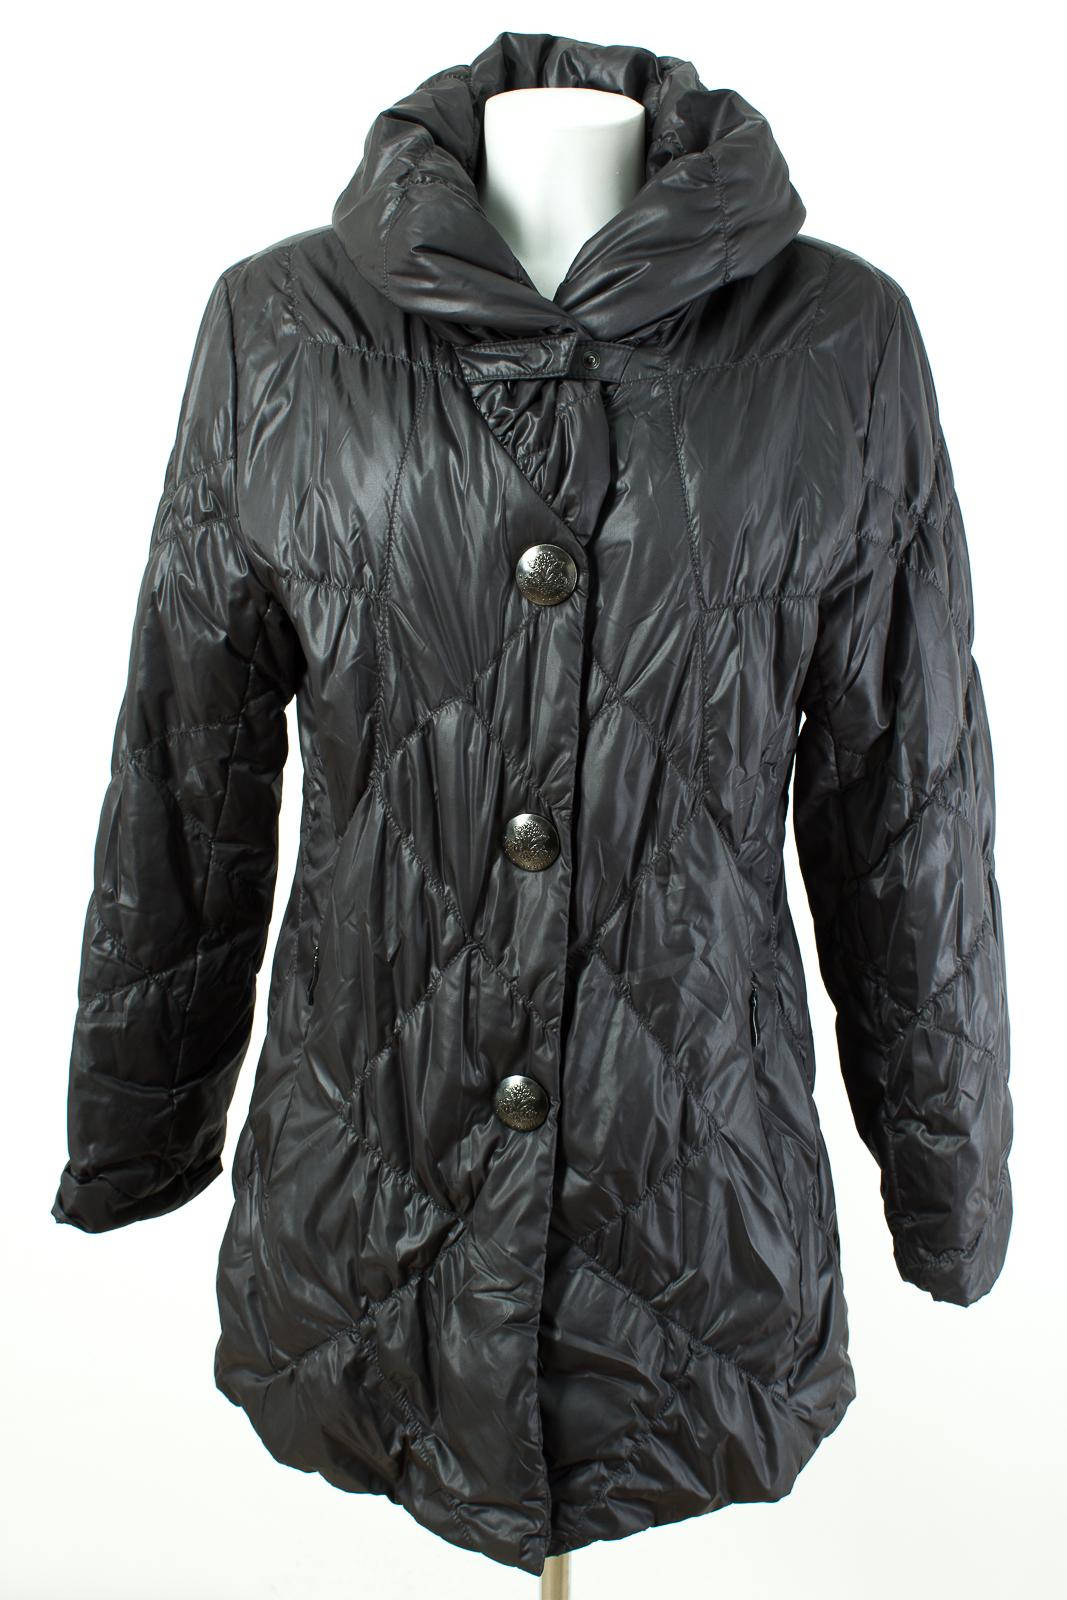 fuchs schmitt mantel gr xl 42 wintermantel steppmantel coat ebay. Black Bedroom Furniture Sets. Home Design Ideas